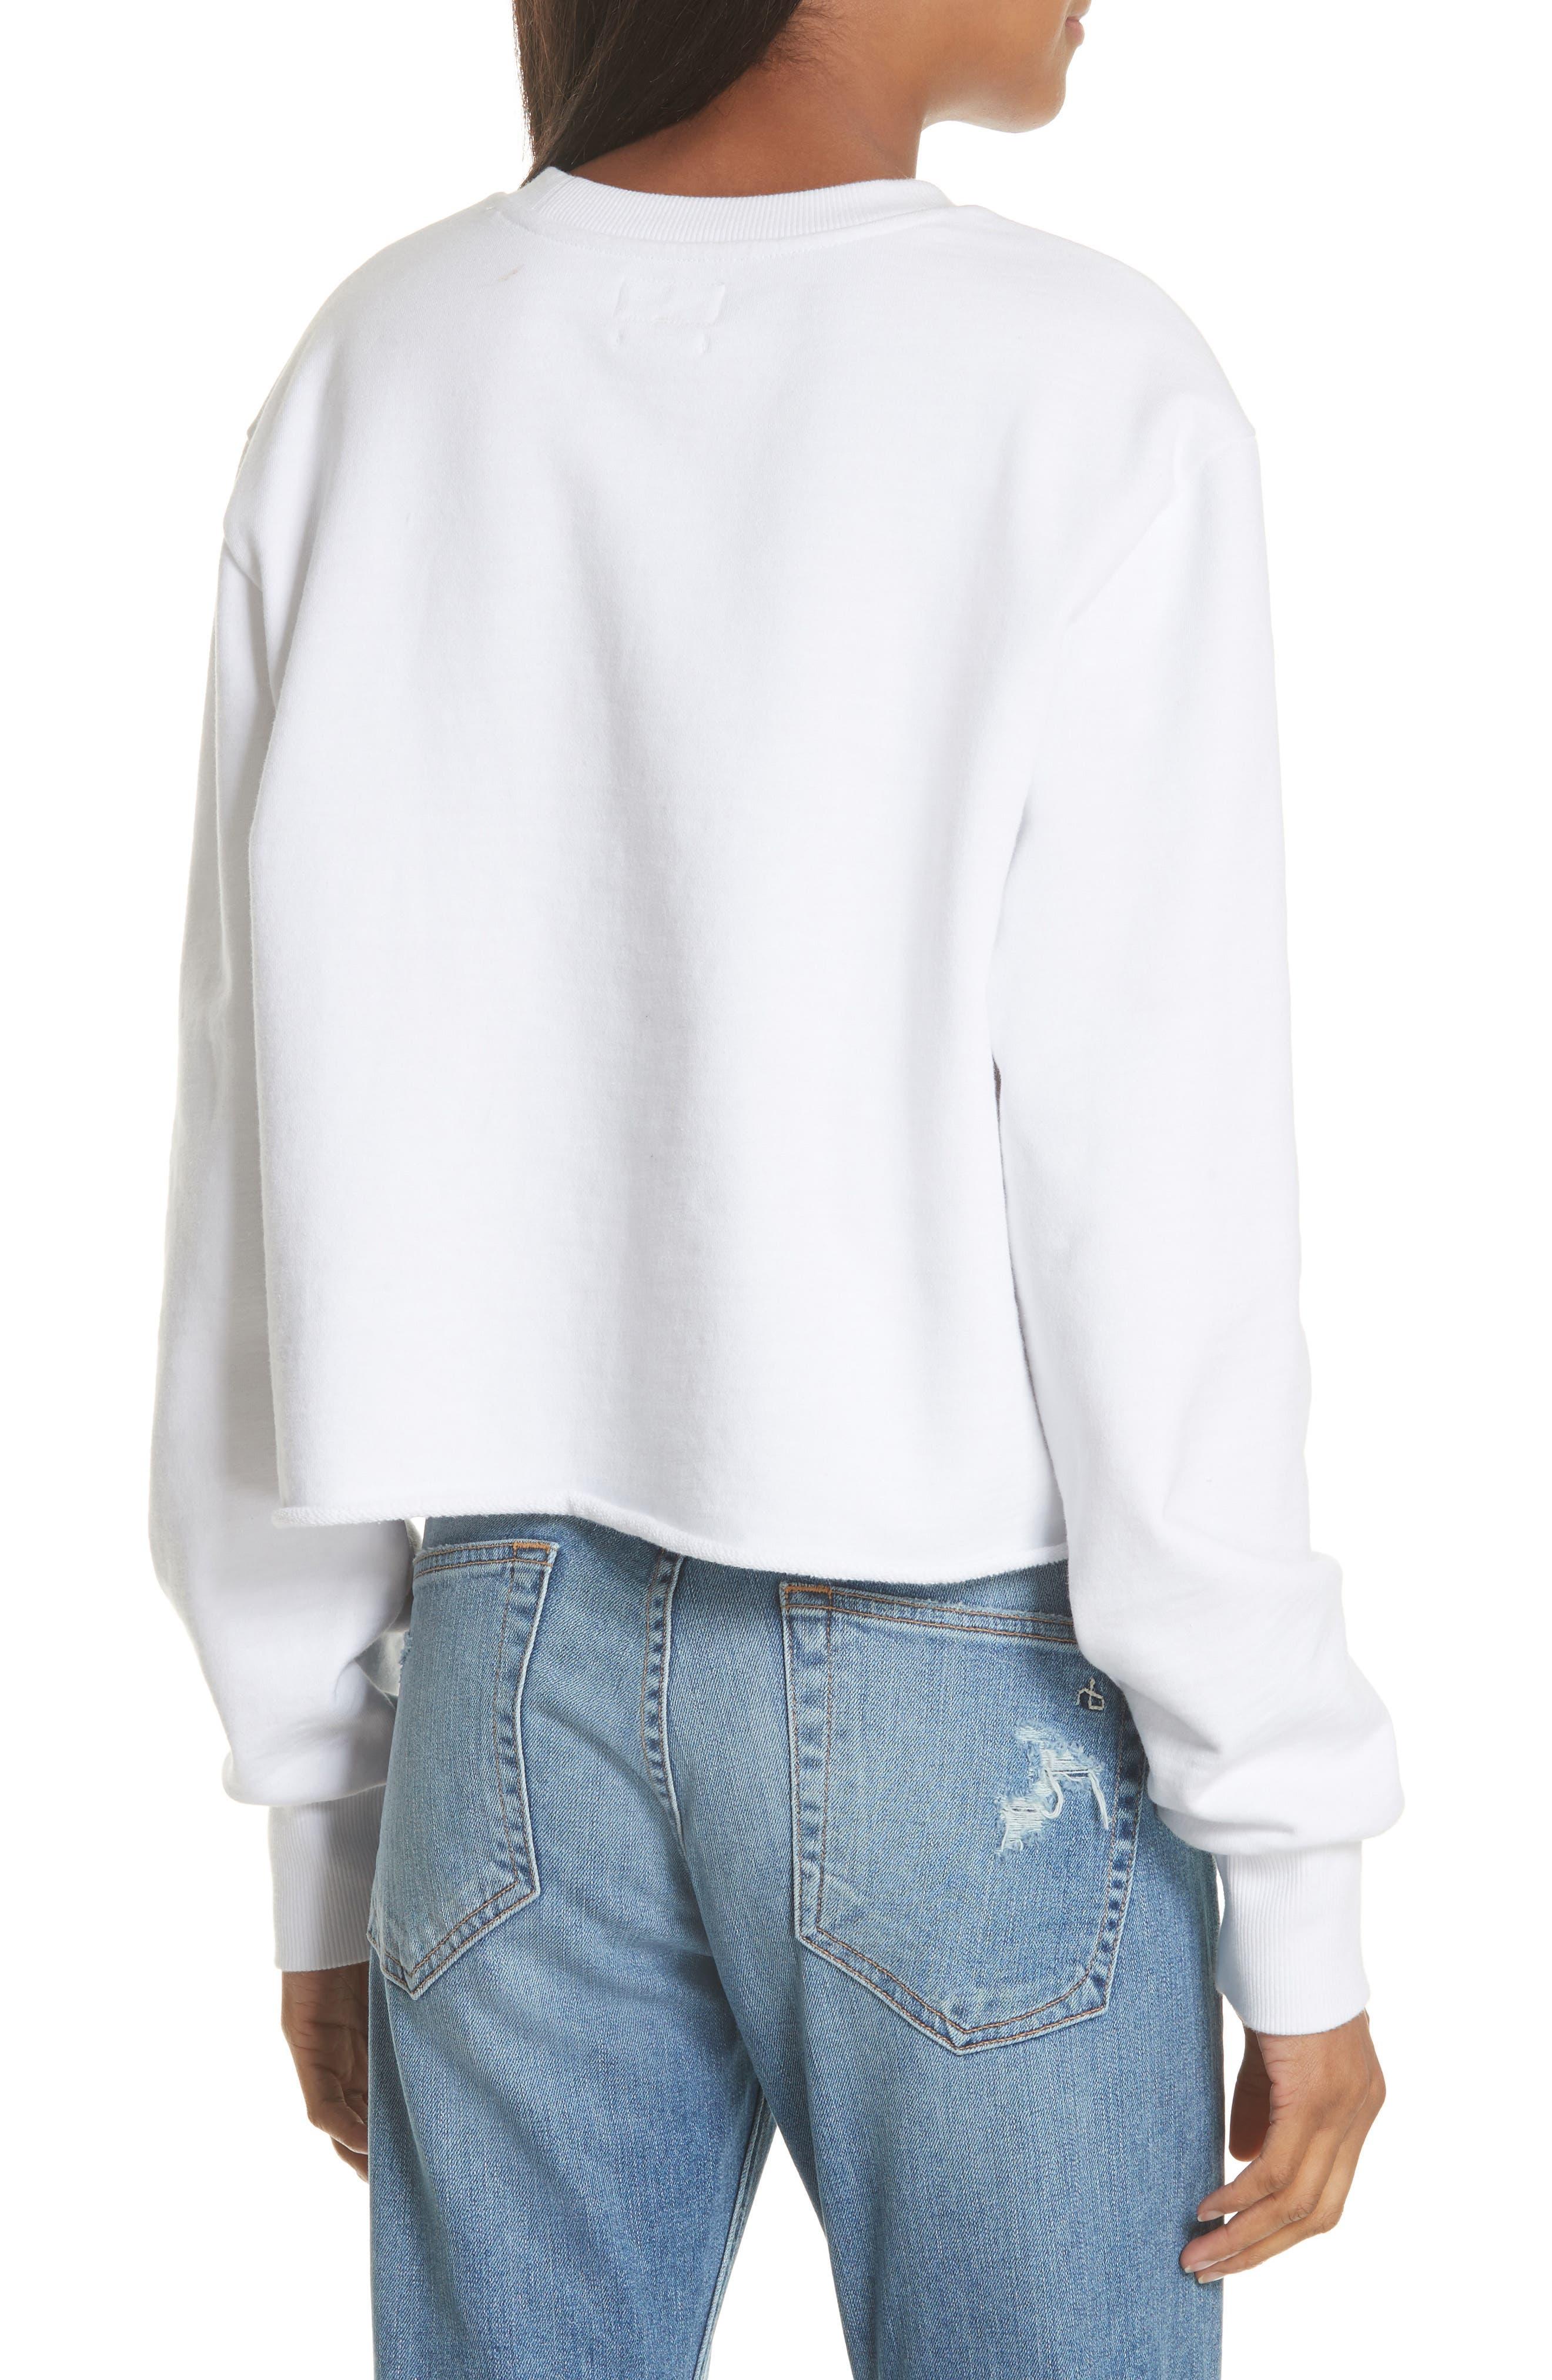 JEAN Glitch Crop Sweatshirt,                             Alternate thumbnail 2, color,                             100